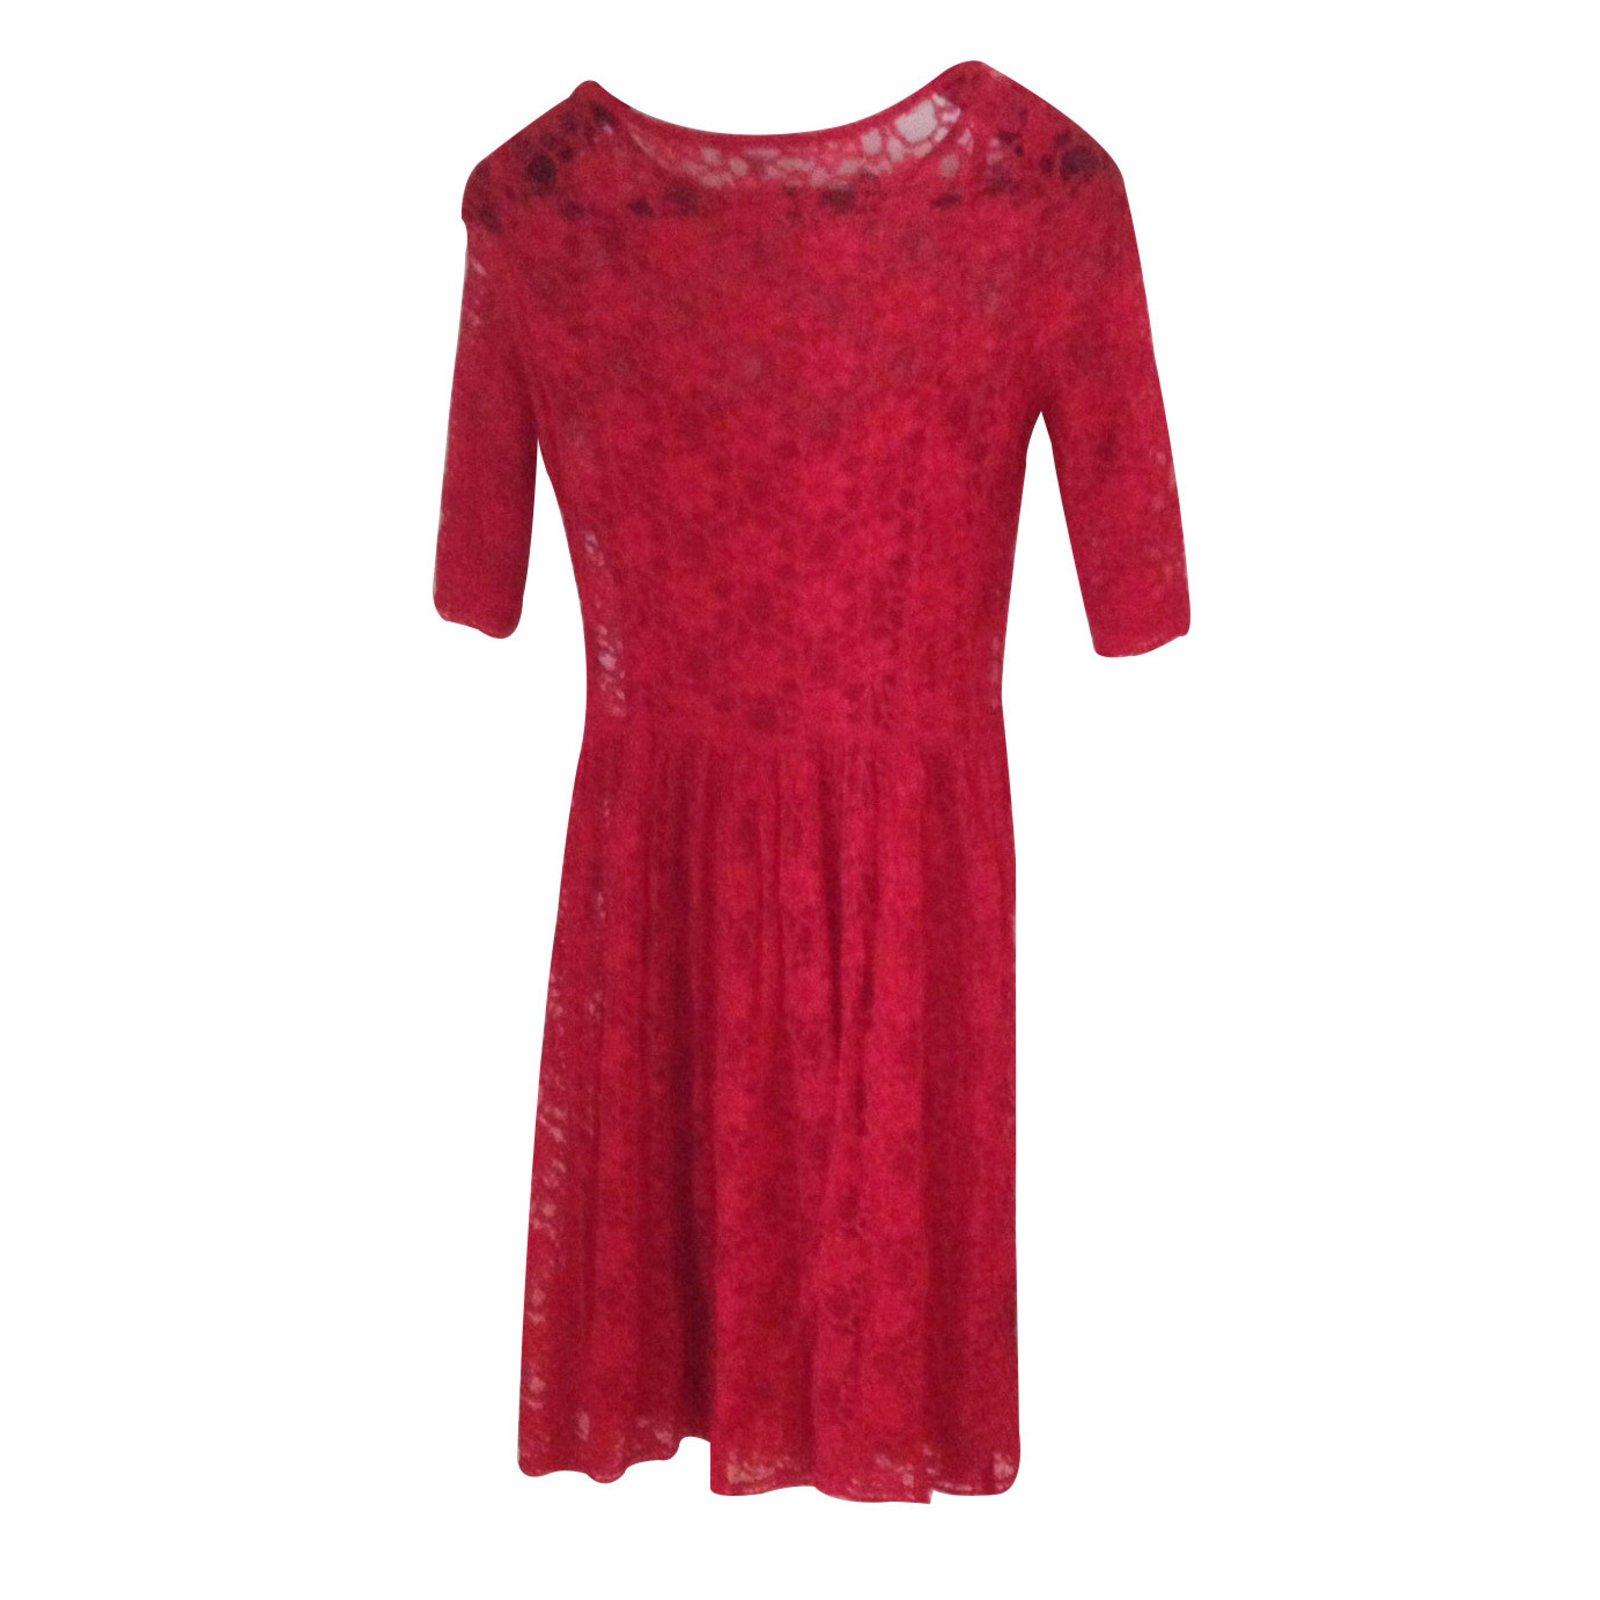 robes autre marque robe etam dentelle rouge joli closet. Black Bedroom Furniture Sets. Home Design Ideas